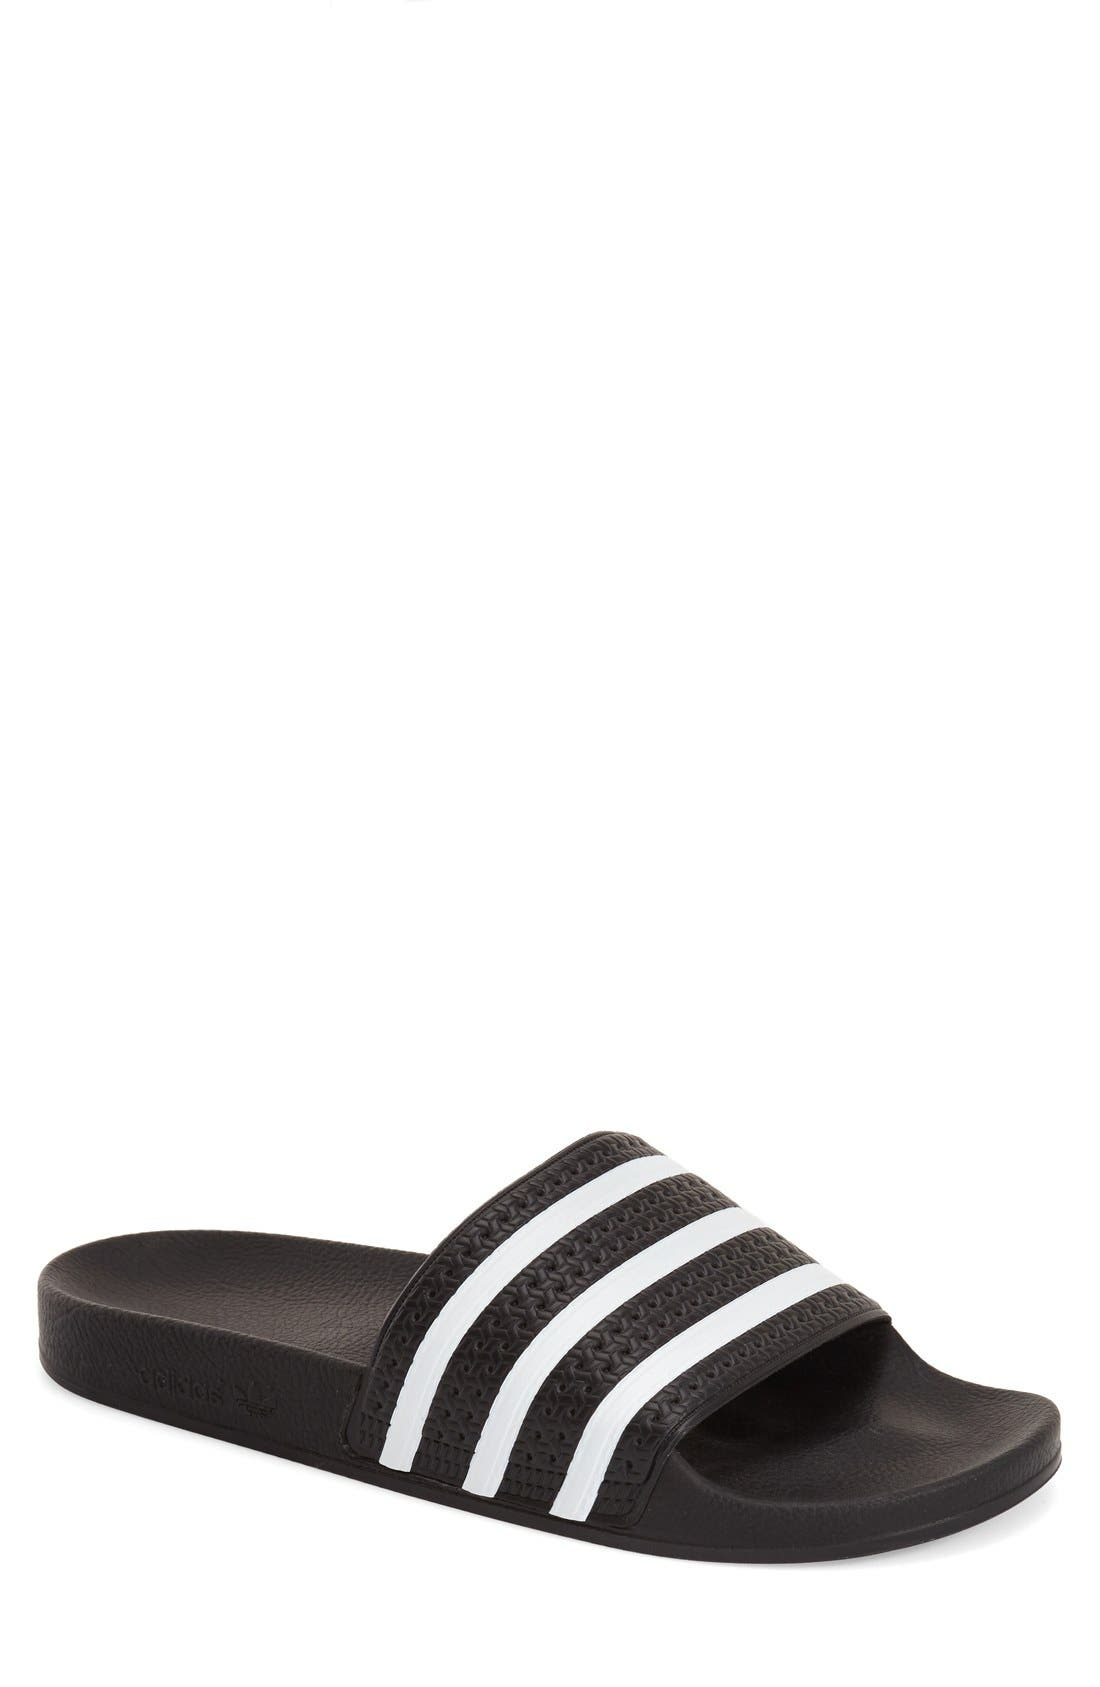 'Adilette' Slide Sandal,                             Main thumbnail 1, color,                             Black/ White/ Black